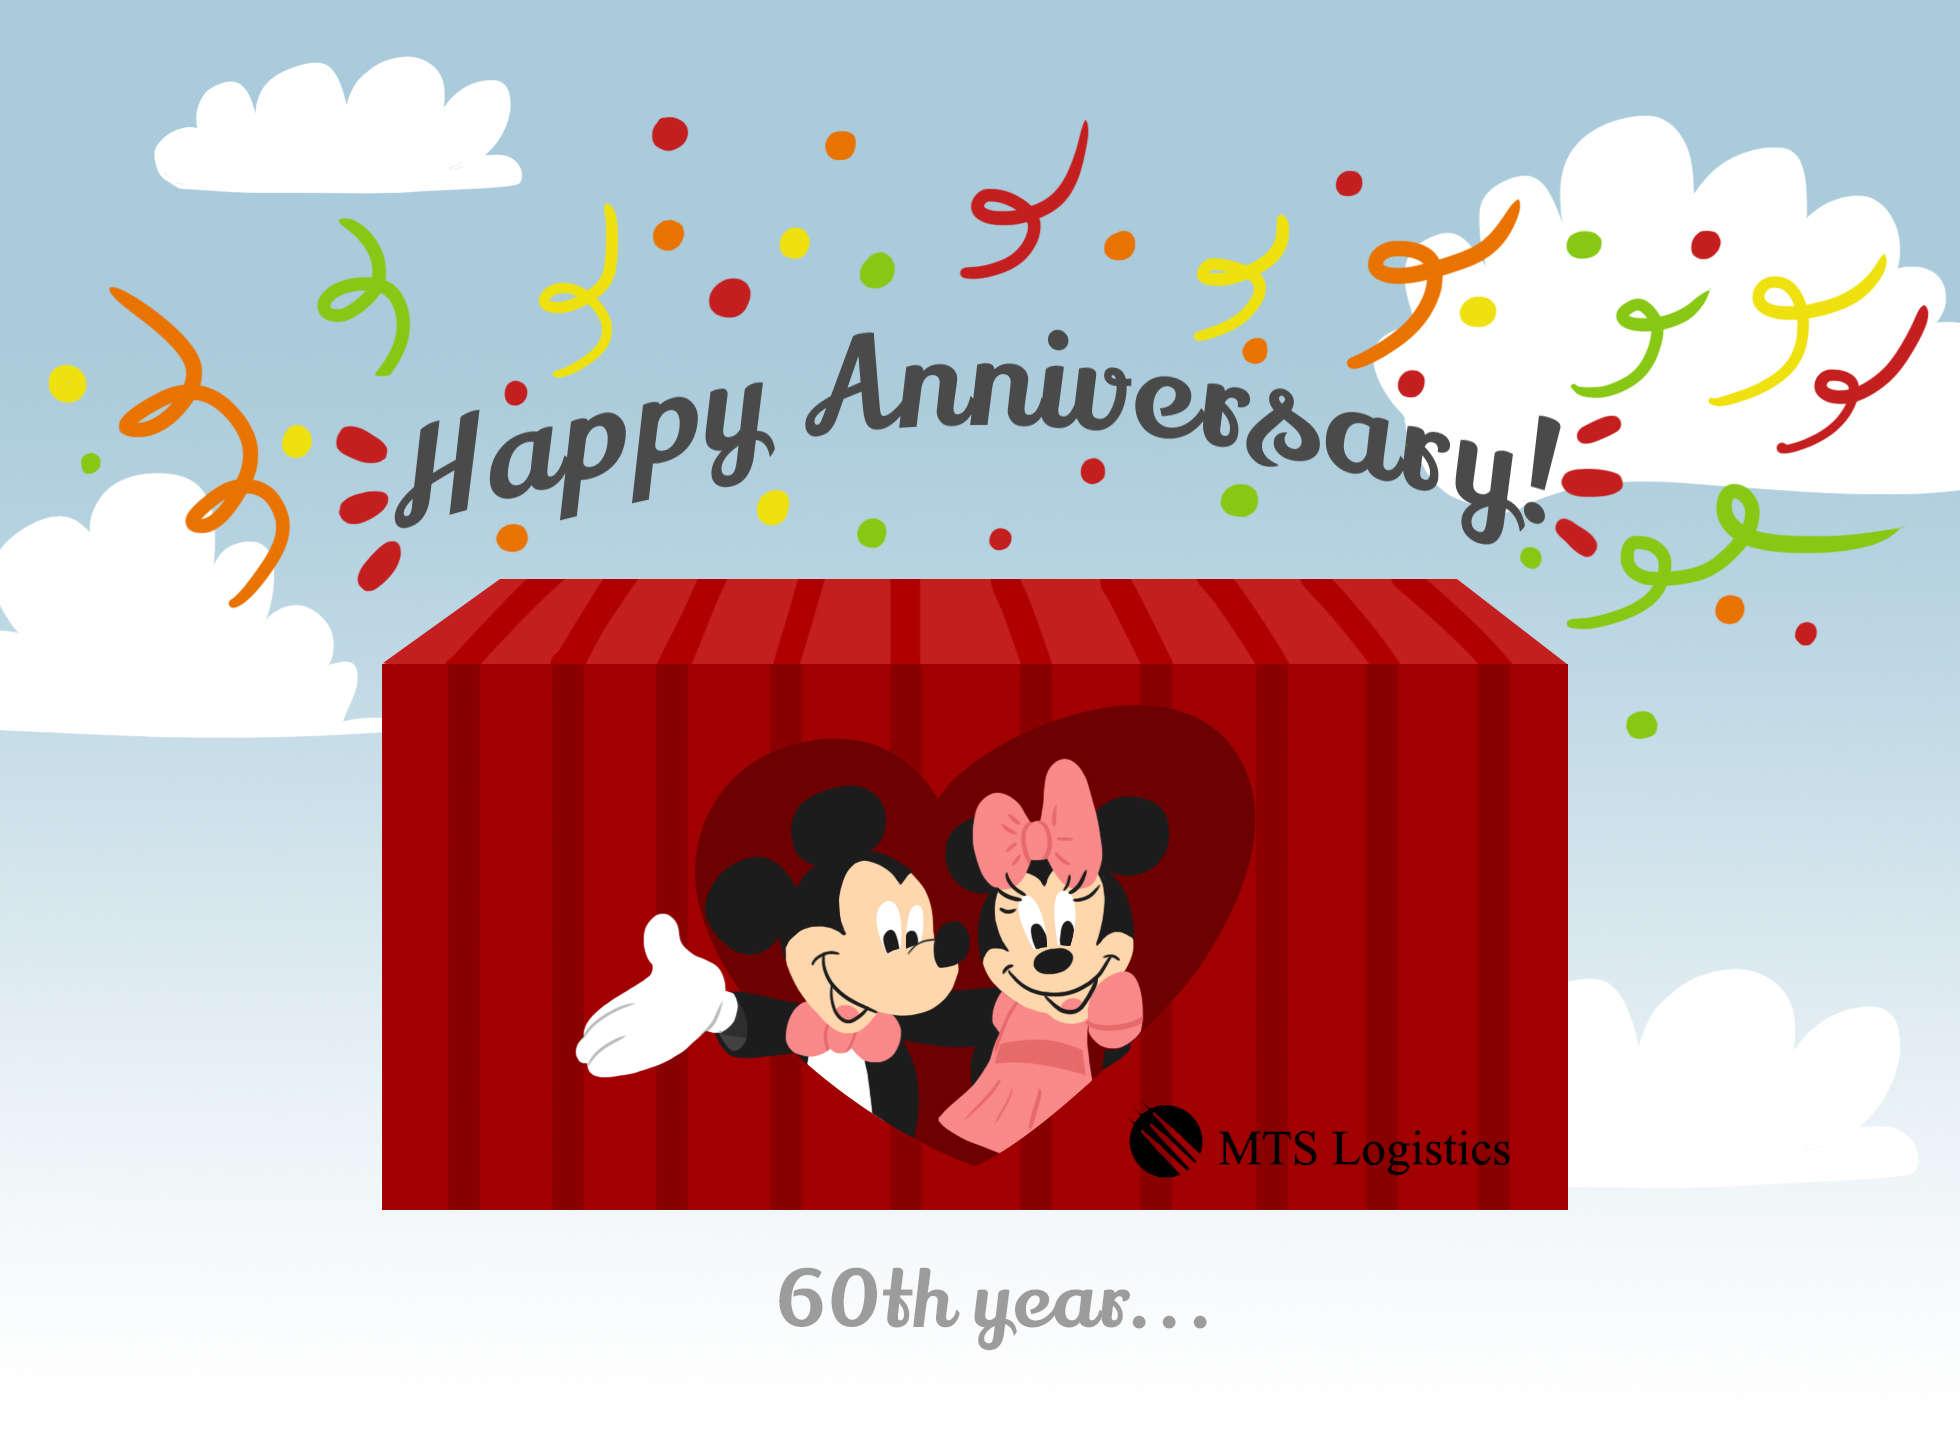 We Ship It! (Happy Anniversary Disneyland!)